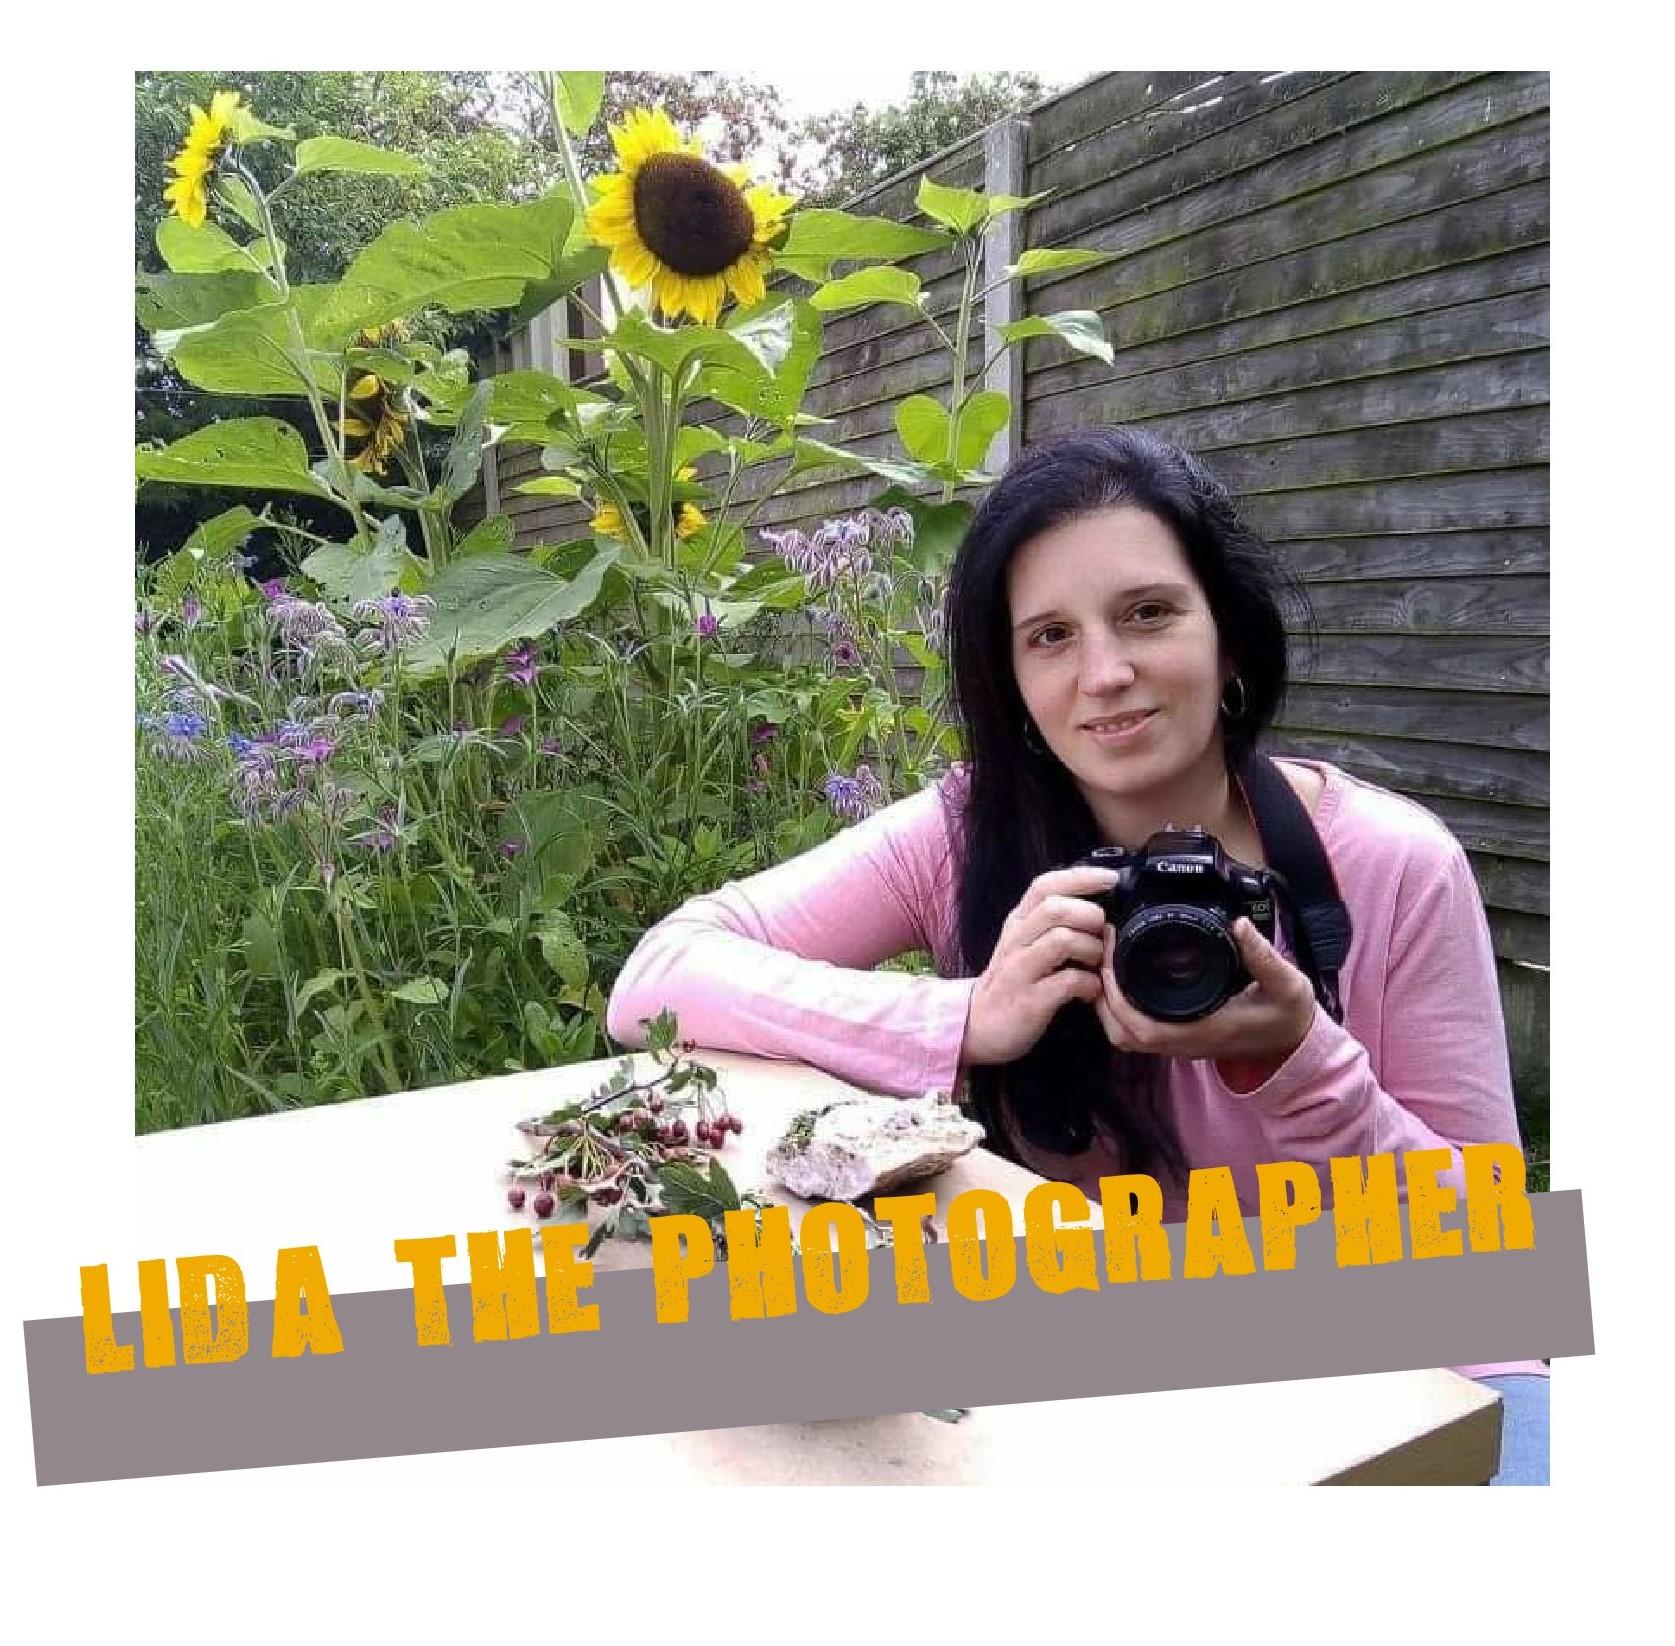 lida-the-photographer-2.jpg